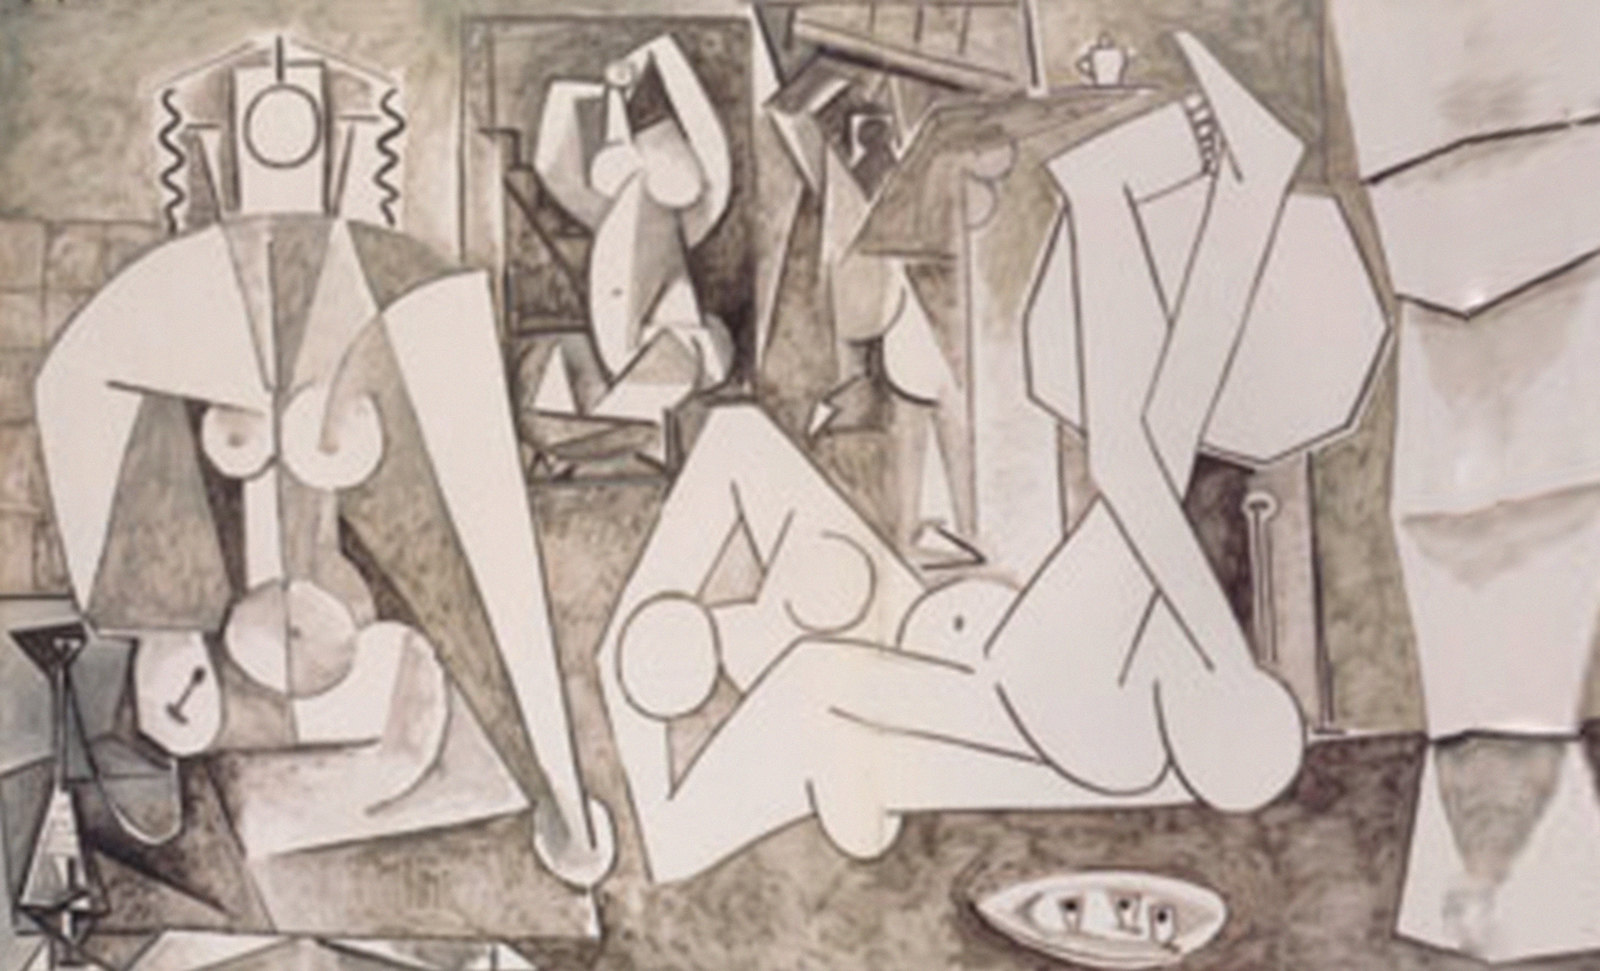 06Delacroix_Picasso